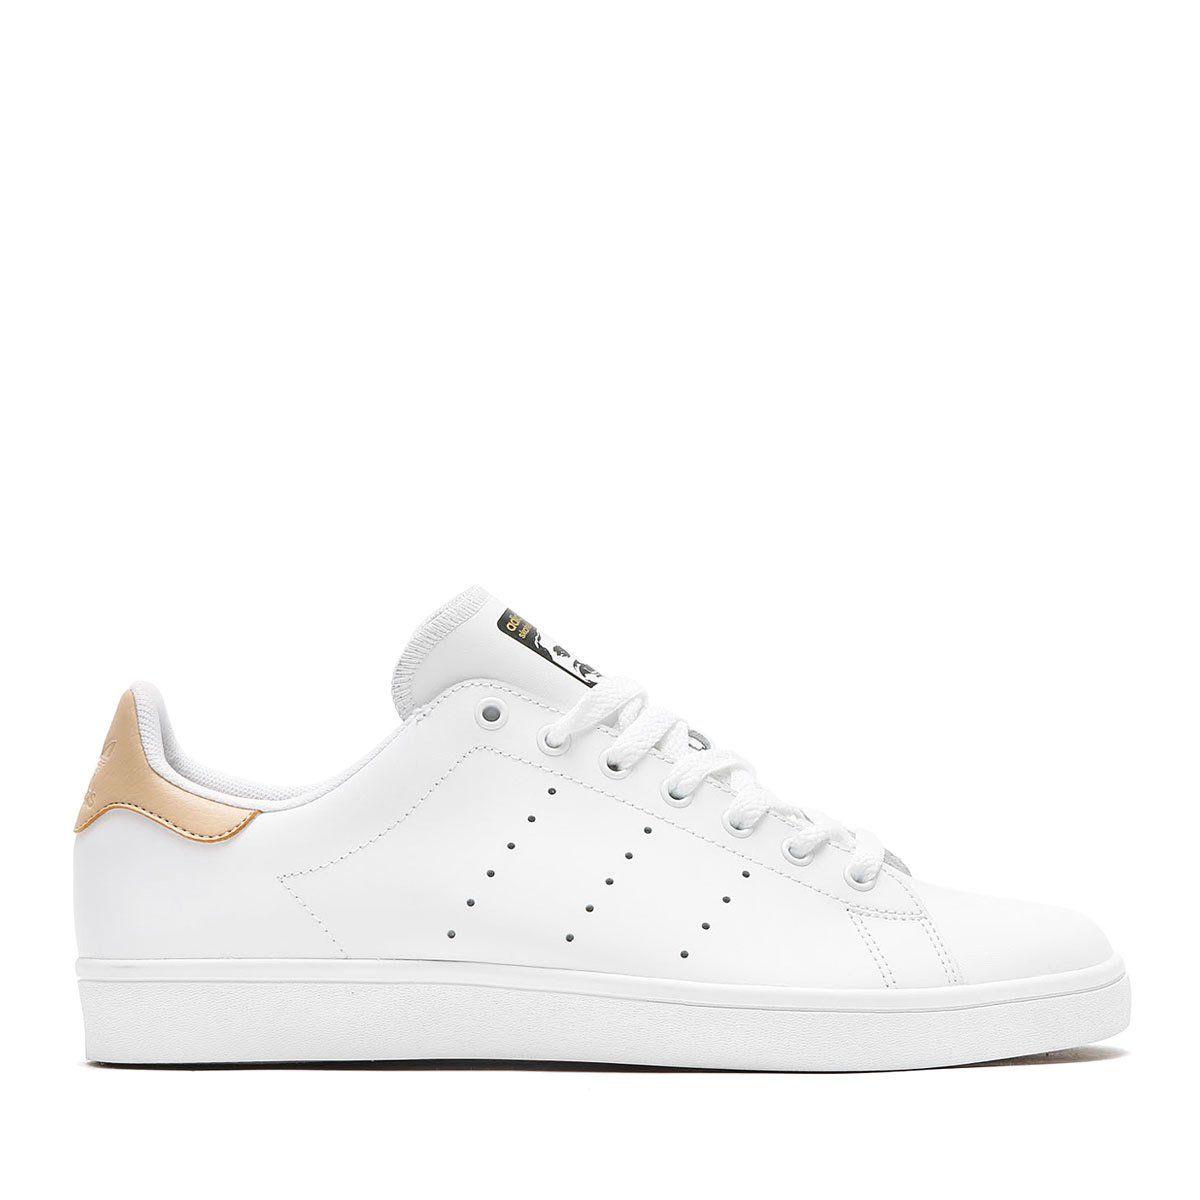 Adidas uomini stan smith, te ftwwht / stpanu / goldmt pattinare scarpa 10 uomini.